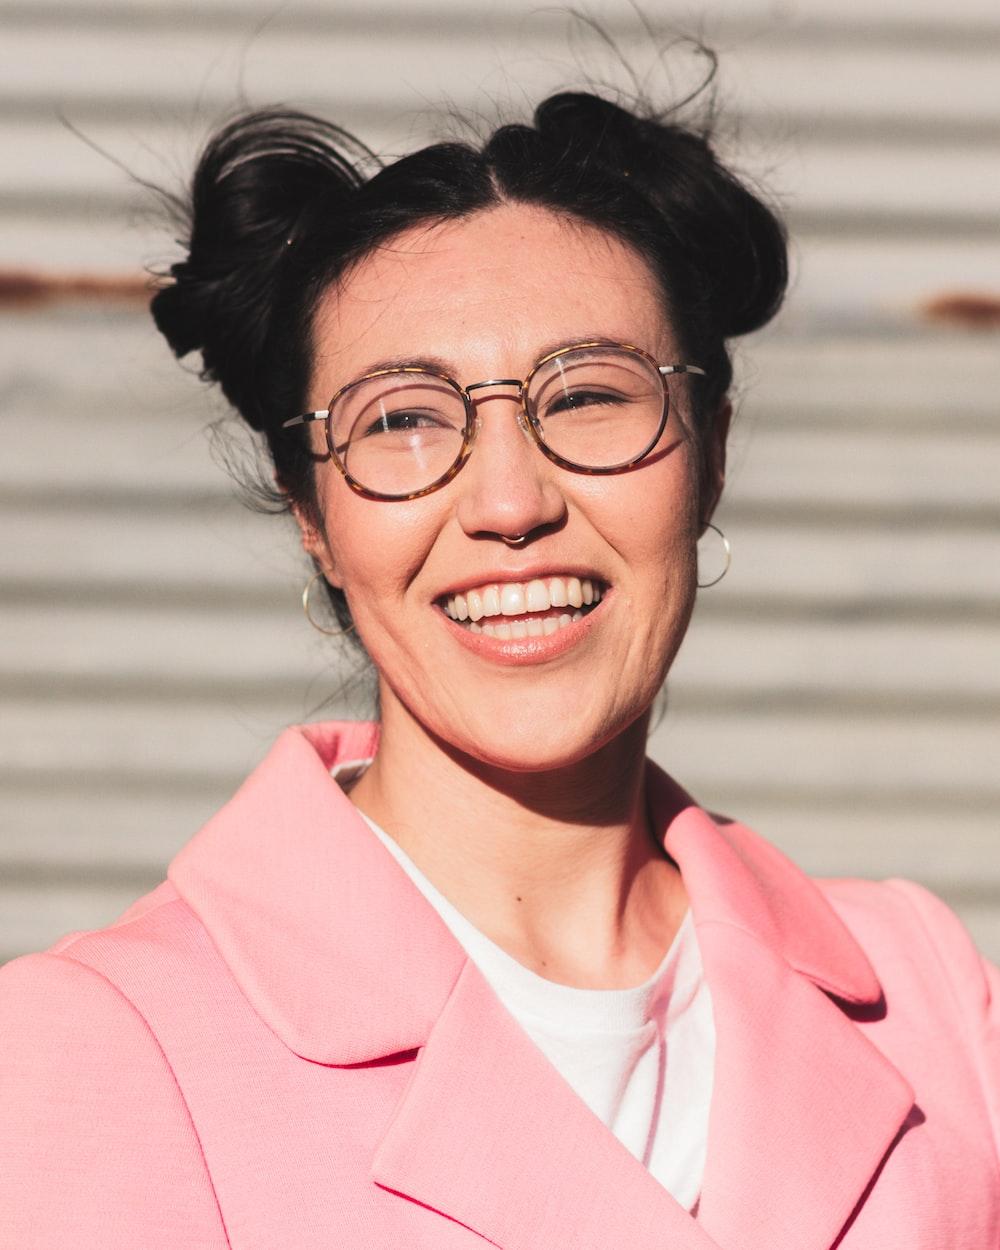 woman in pink blazer smiling